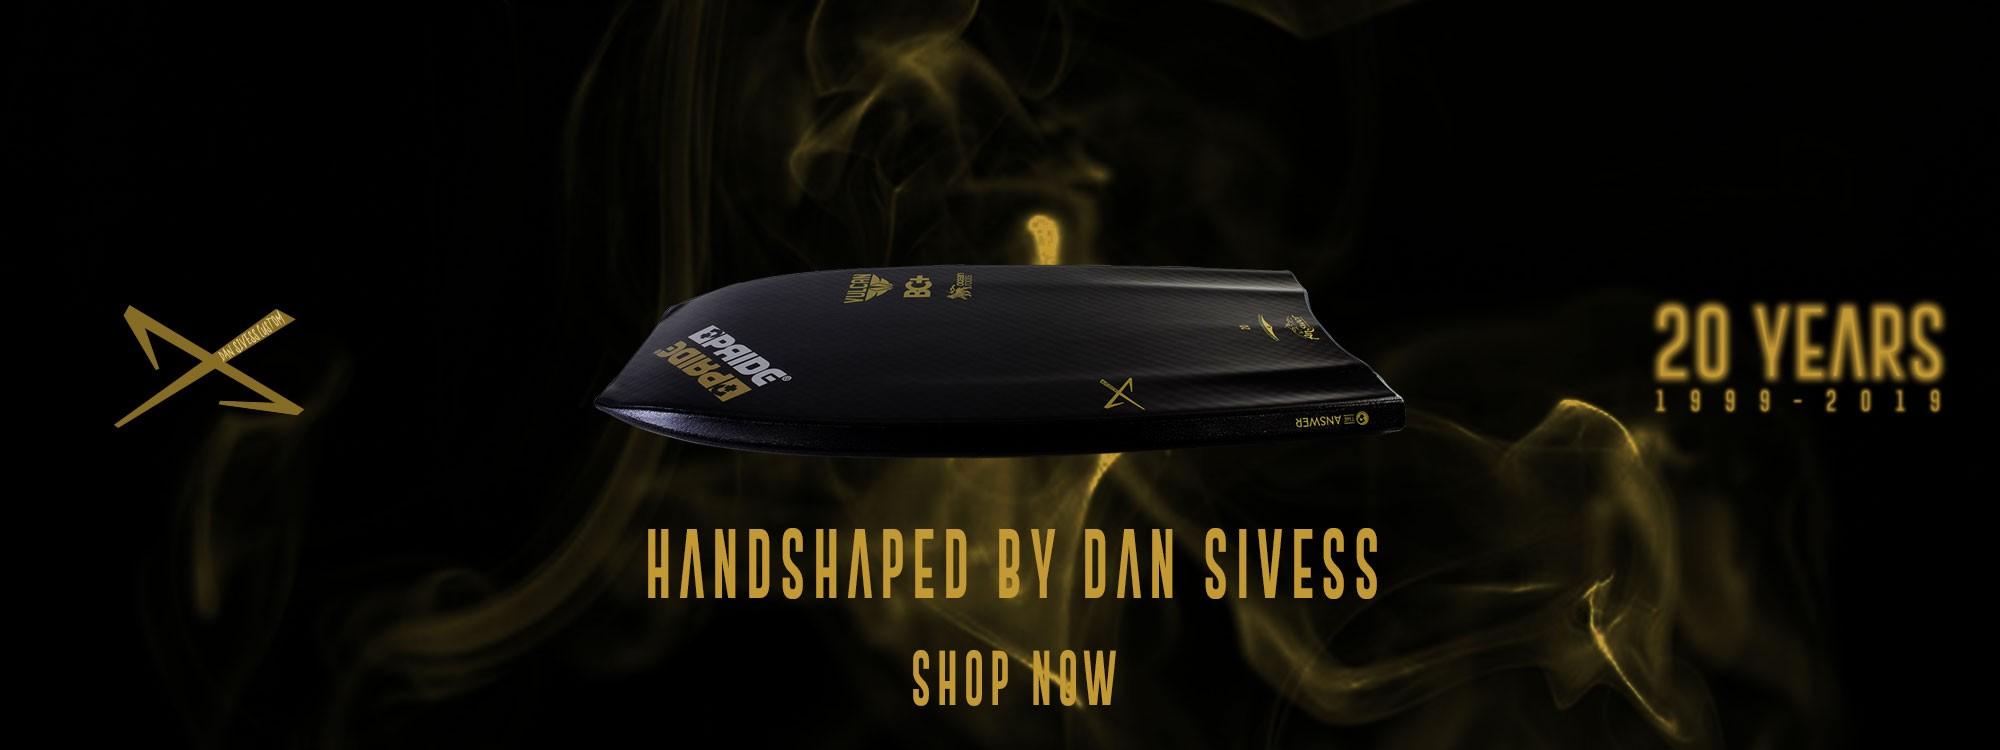 Pride 20th Anniversary - Hand Shaped custom boards by Dan Sivess